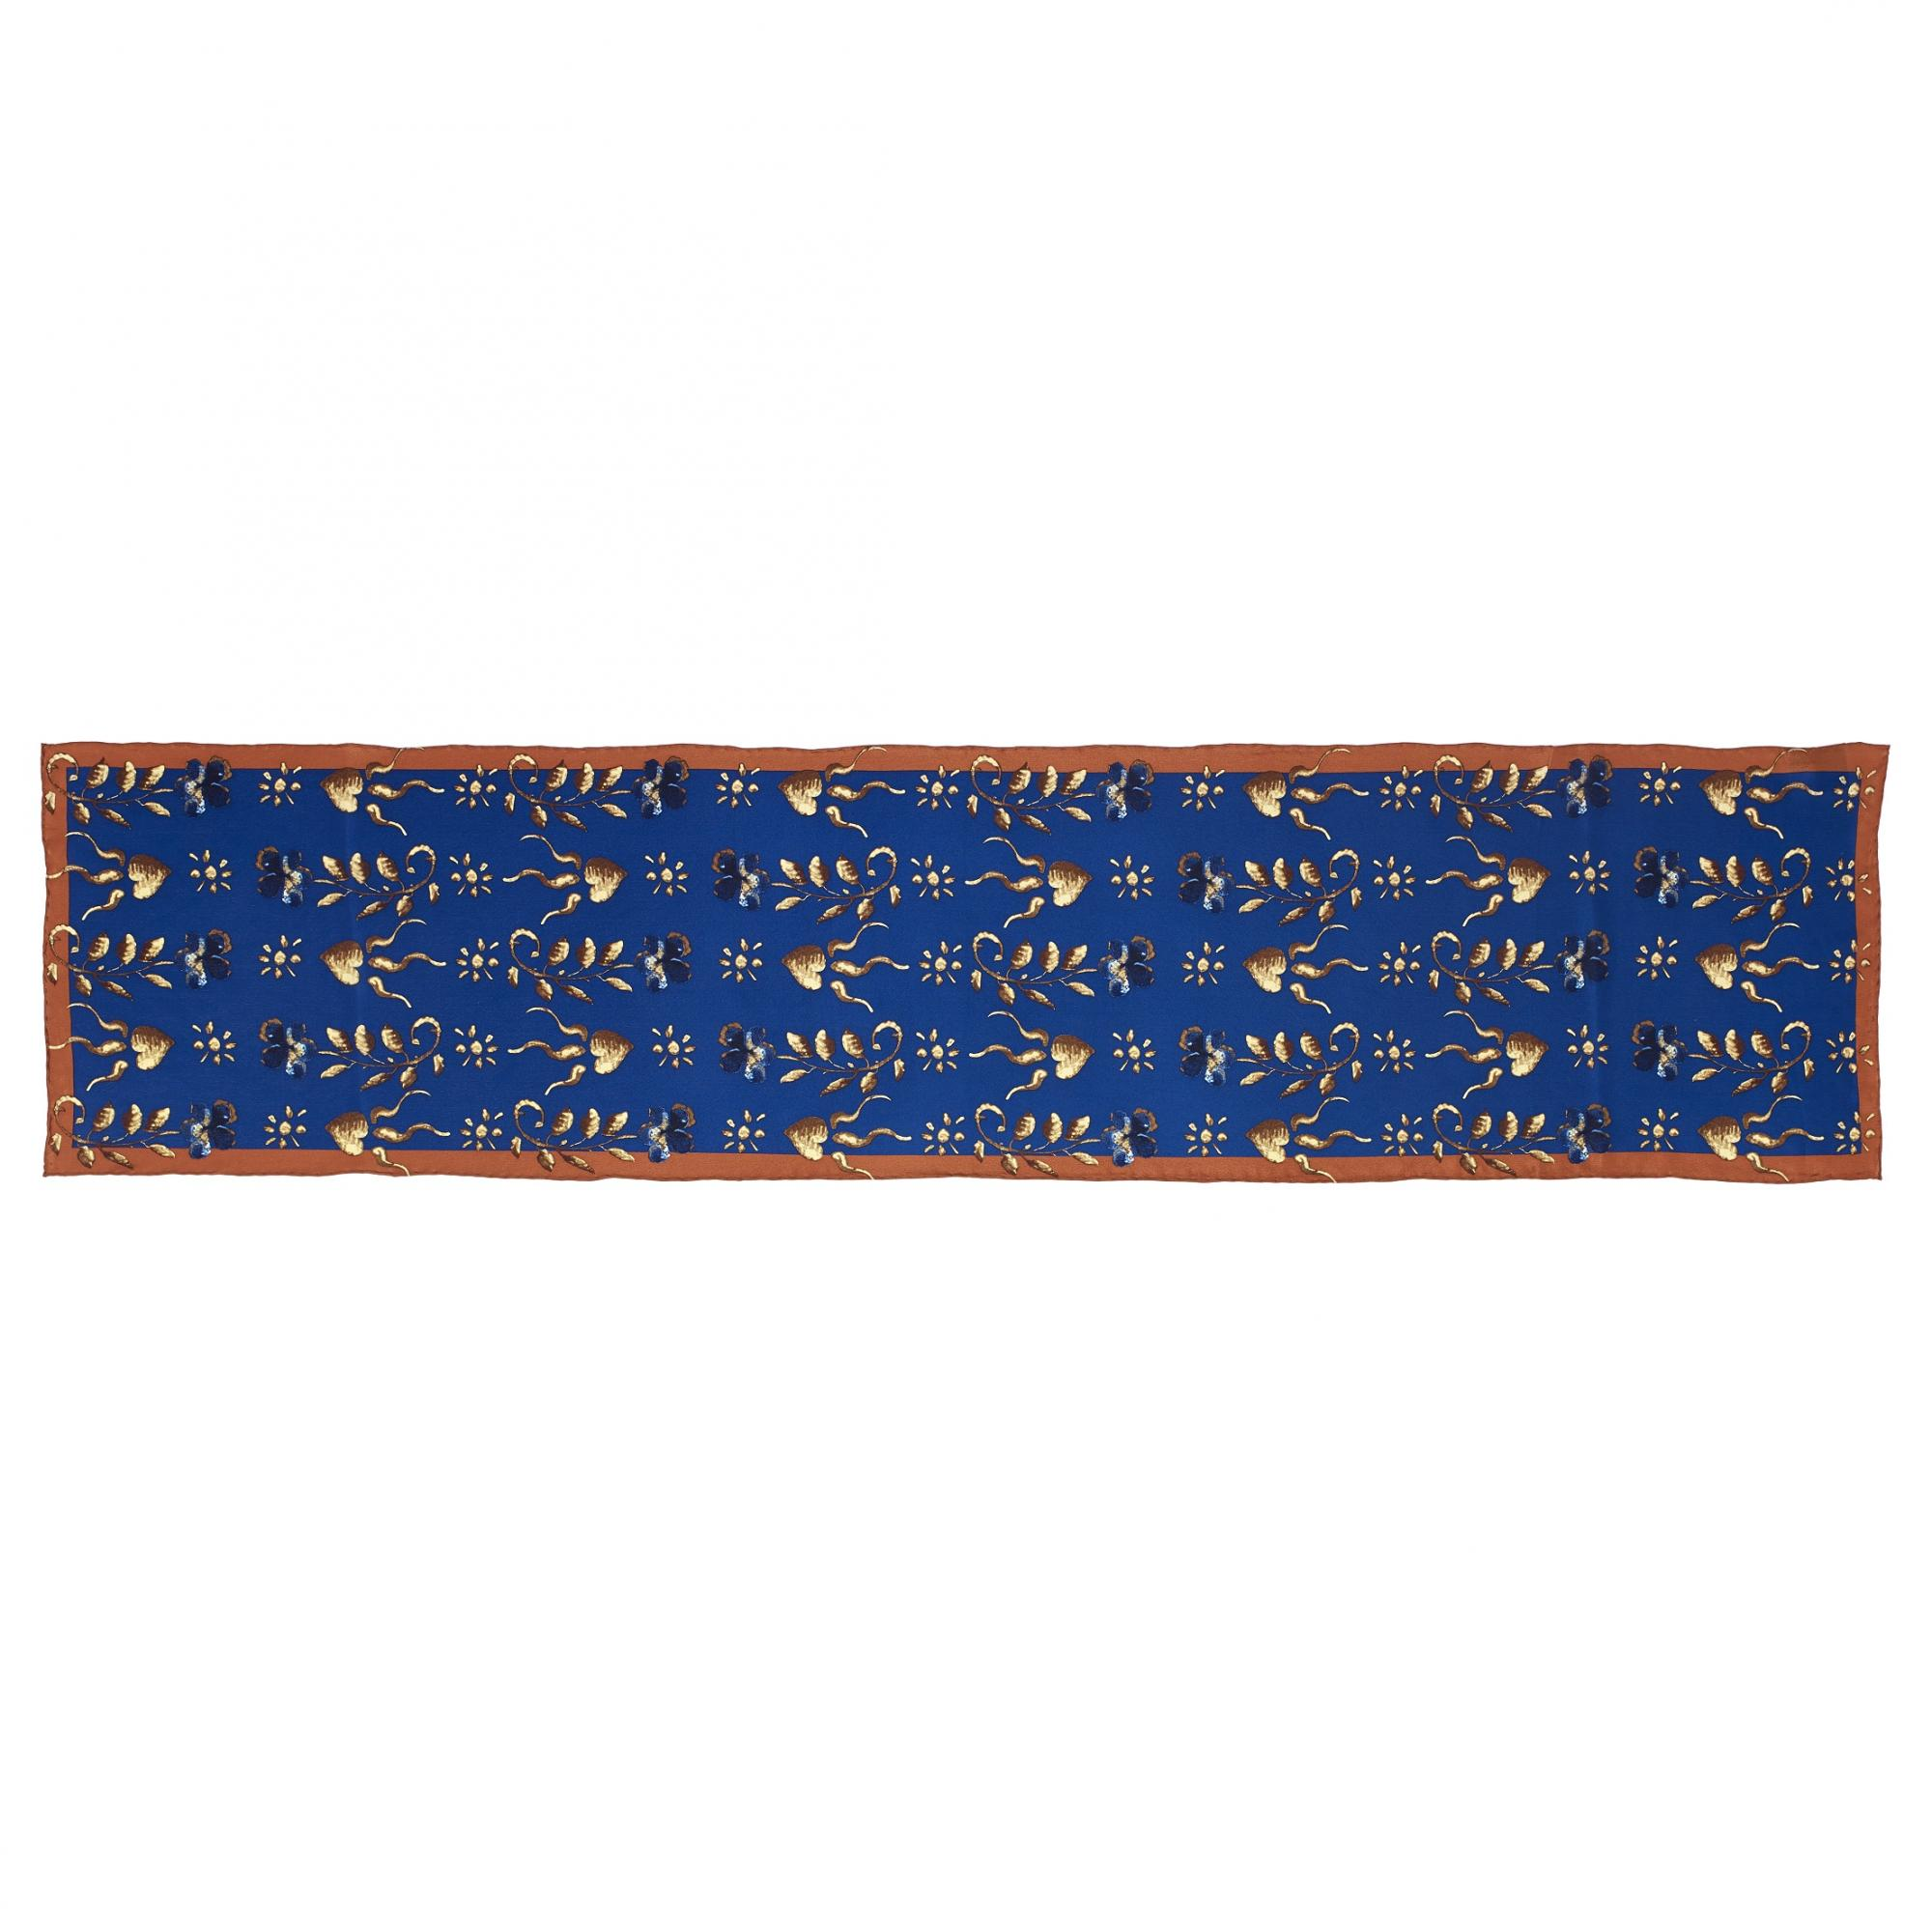 Detail of Lady Mary Erskine by George Jamesone blue silk scarf